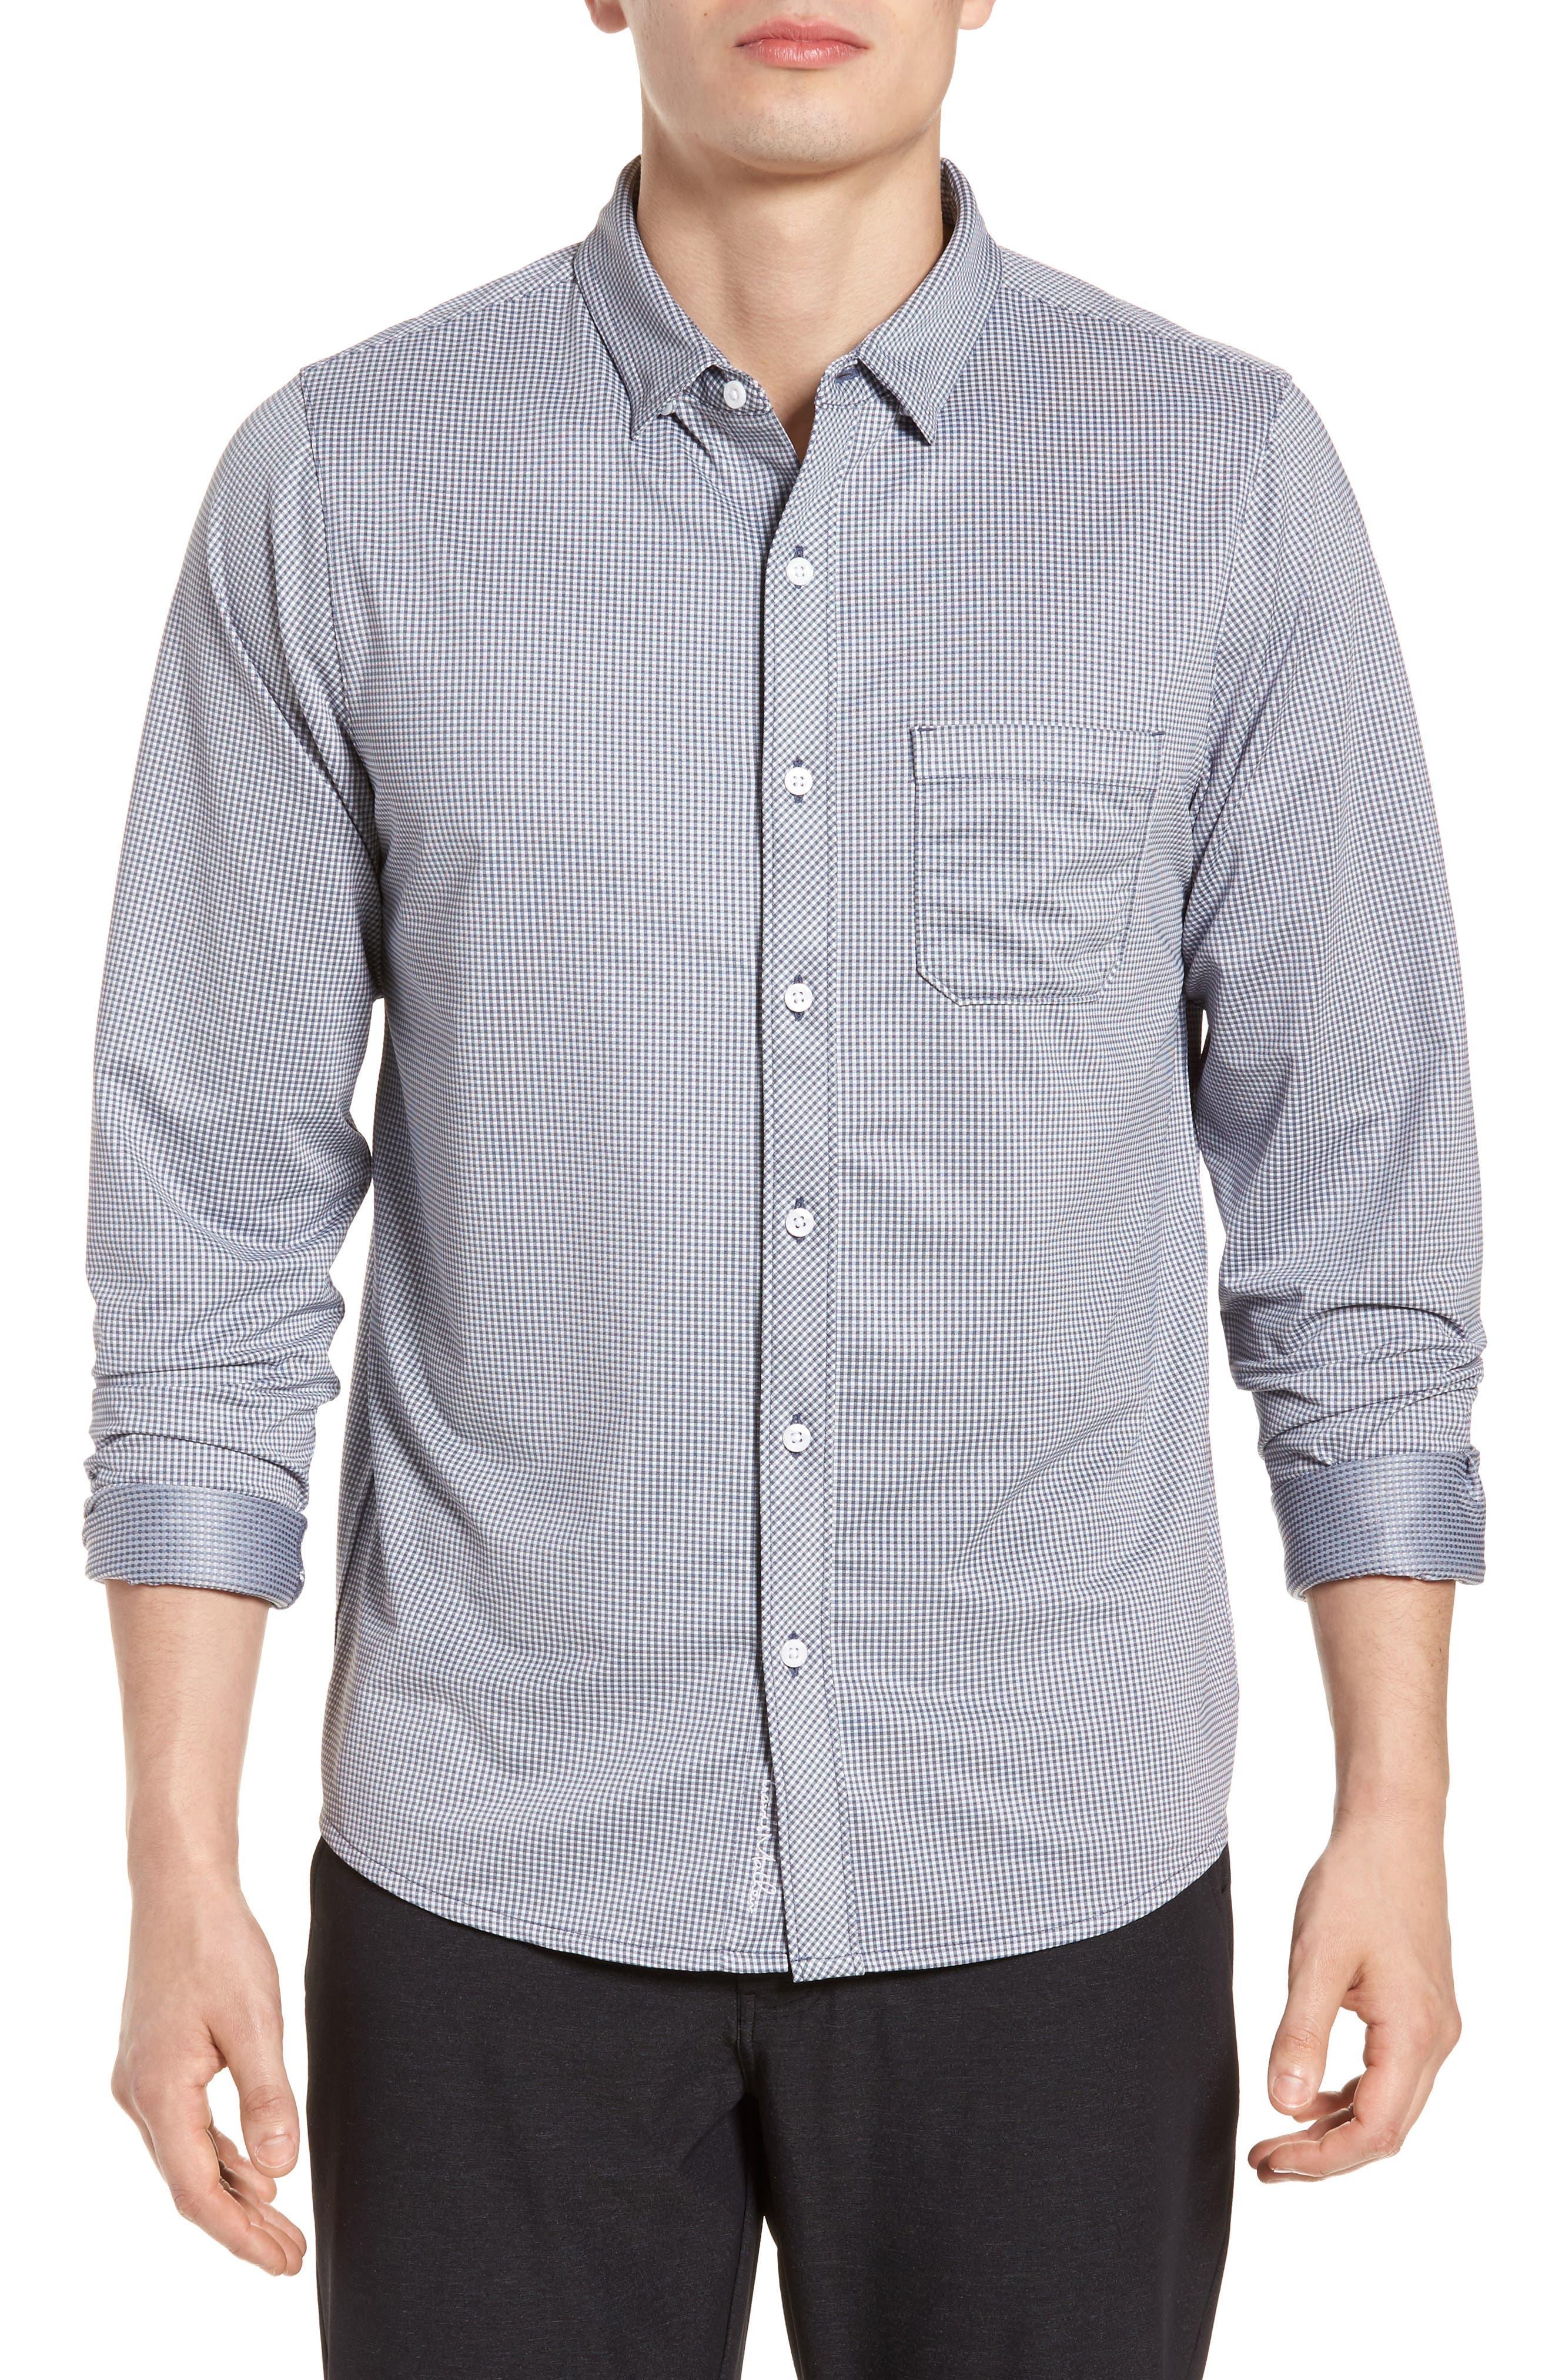 TRAVIS MATHEW Couig Gingham Sport Shirt, Main, color, 105